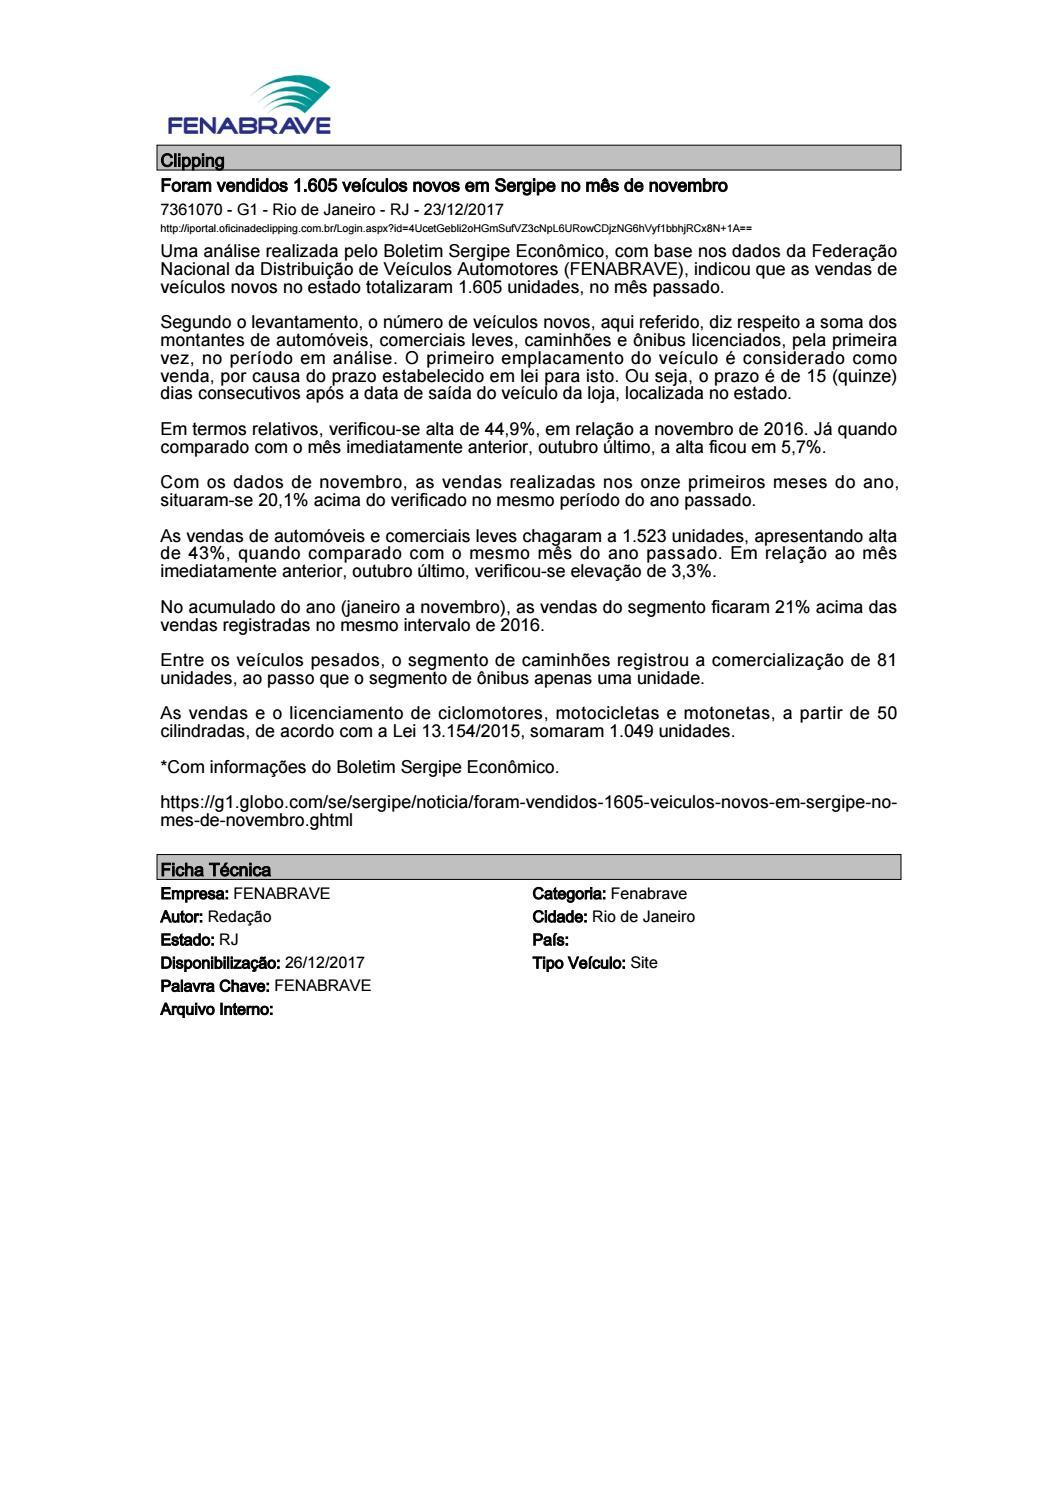 77cb51dbf0cf7 Clipping Fenabrave 26.12.2017 by MCE Comunicação - issuu